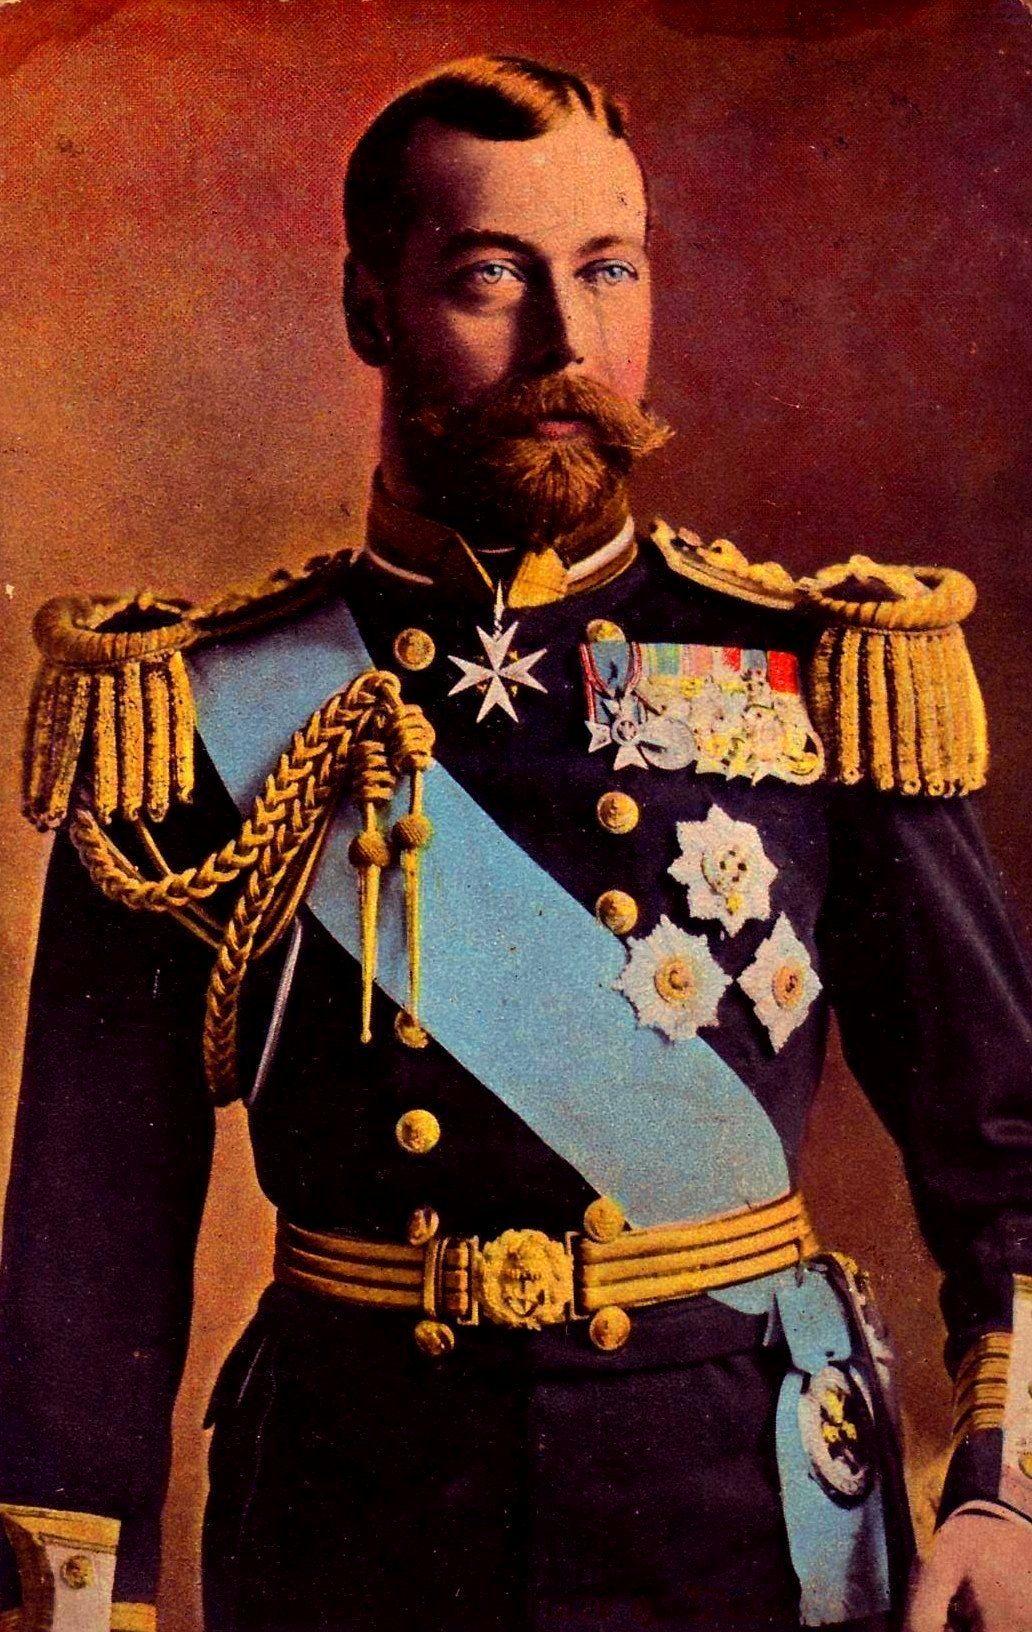 Resultado de imagen para Fotos de Jorge V, rey británico